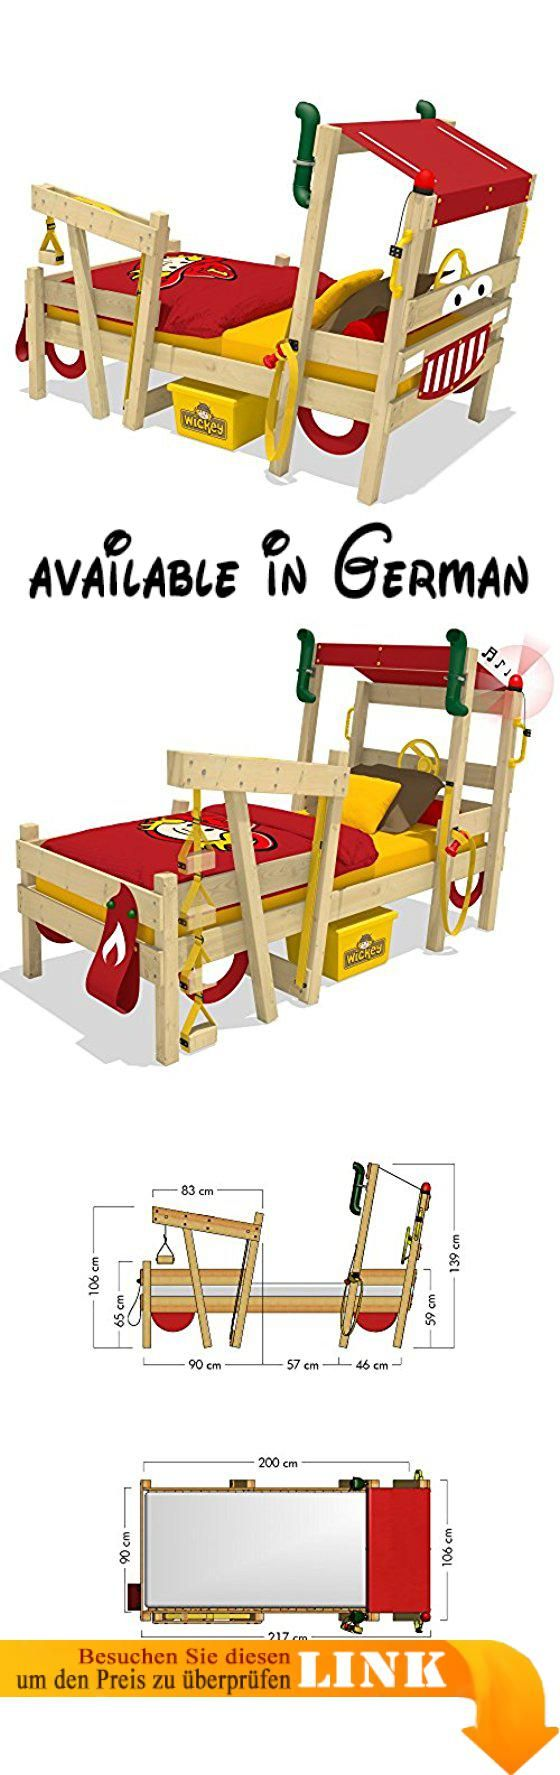 Aufbauanleitung Feuerwehrbett